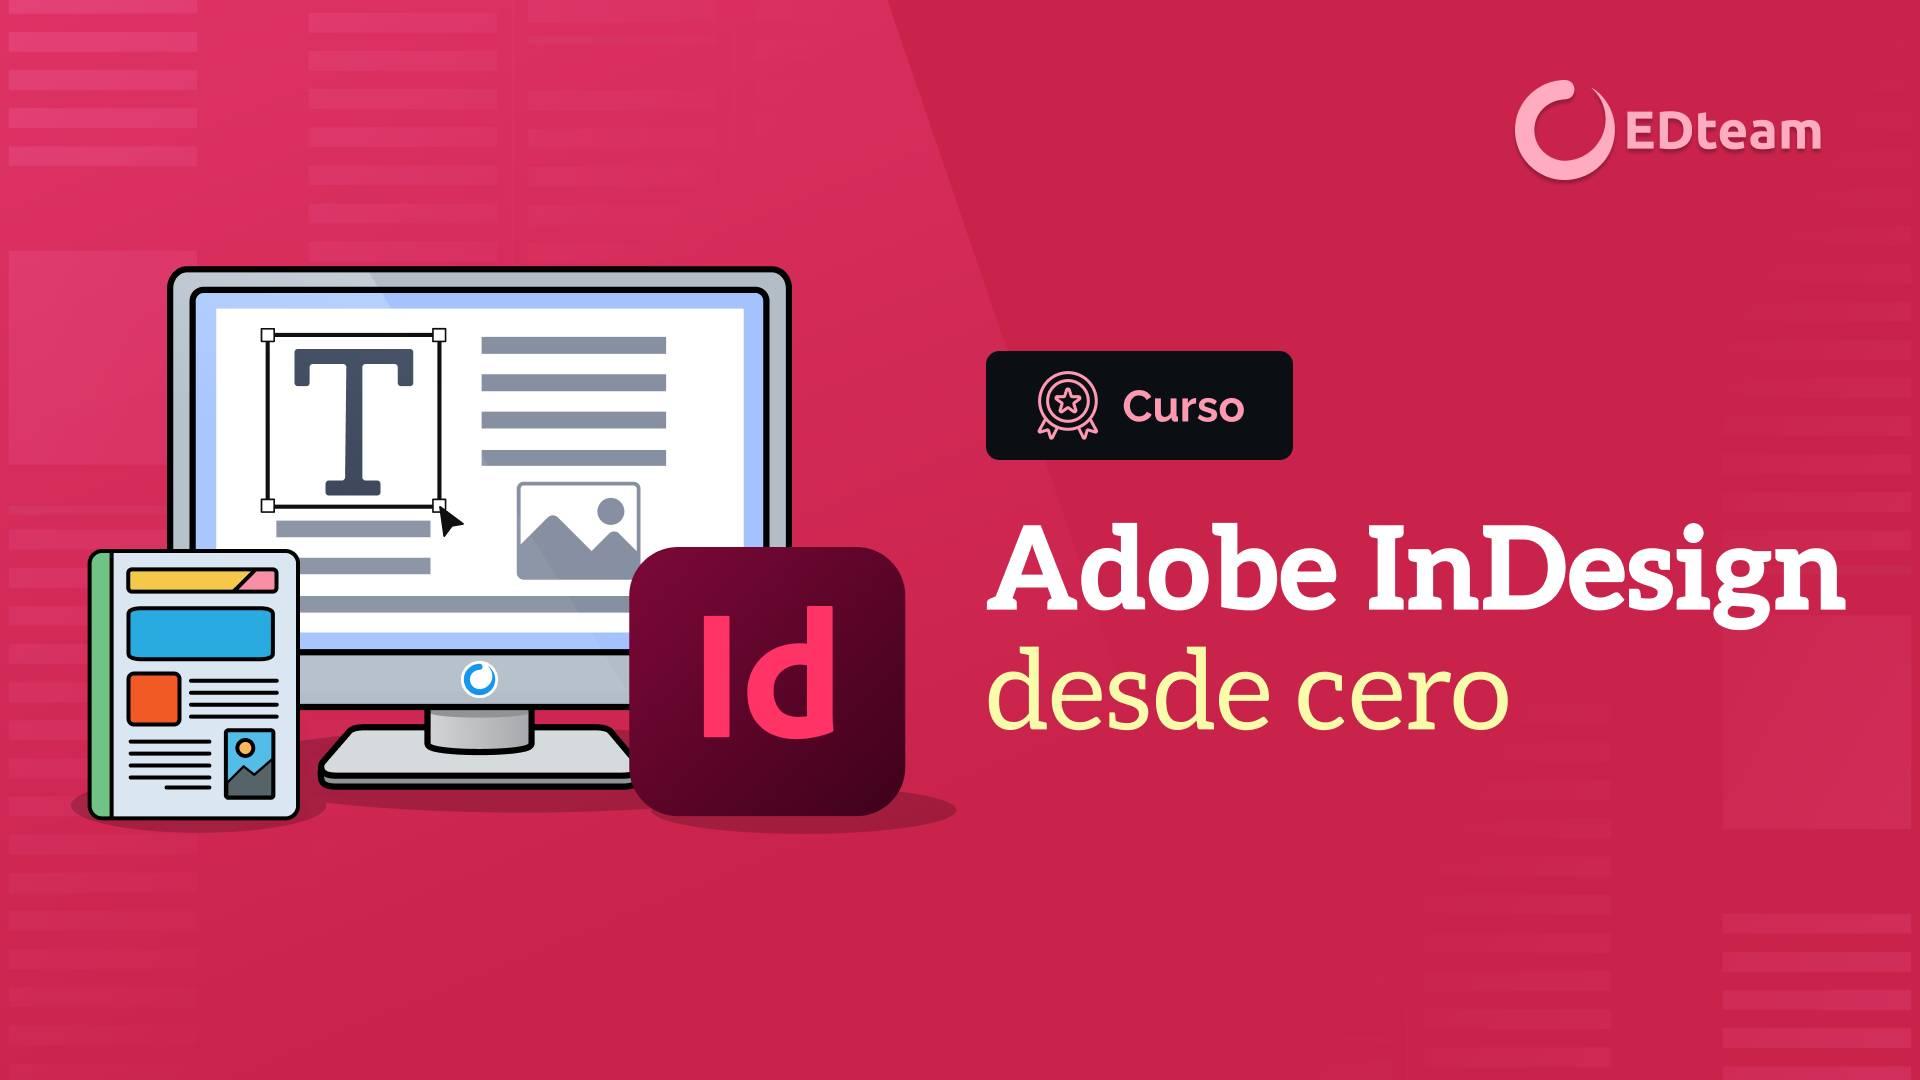 1.2 - Descubre el poder de Adobe InDesign